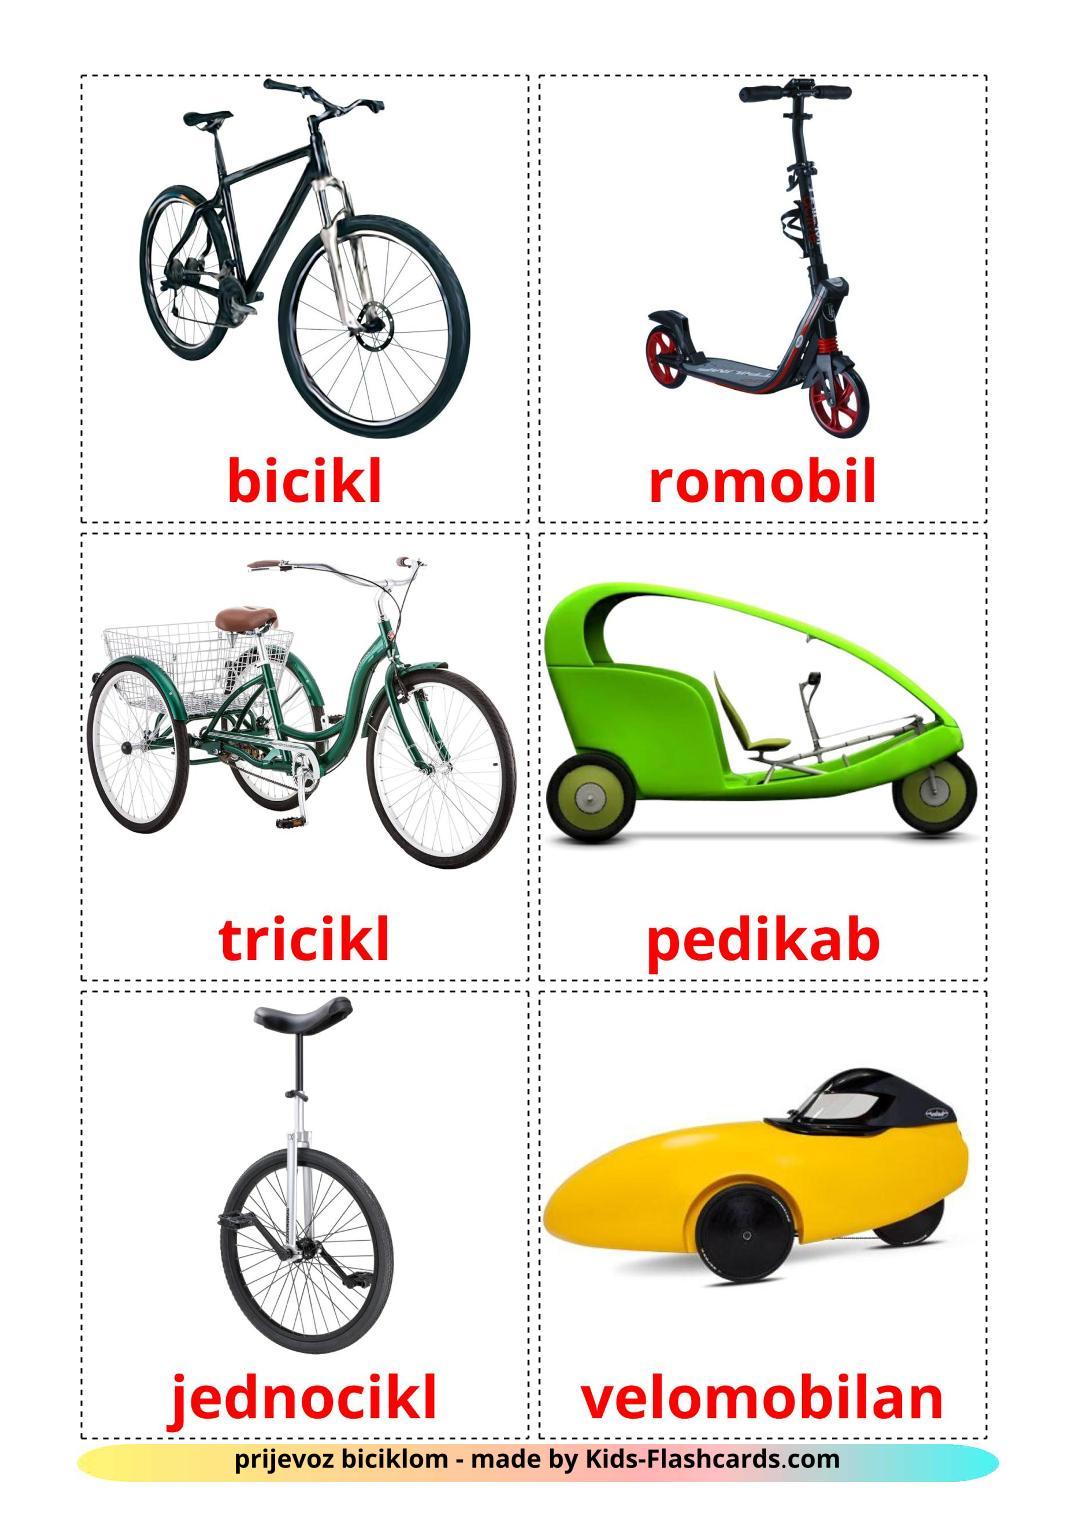 Bicycle transport - 16 Free Printable croatian Flashcards